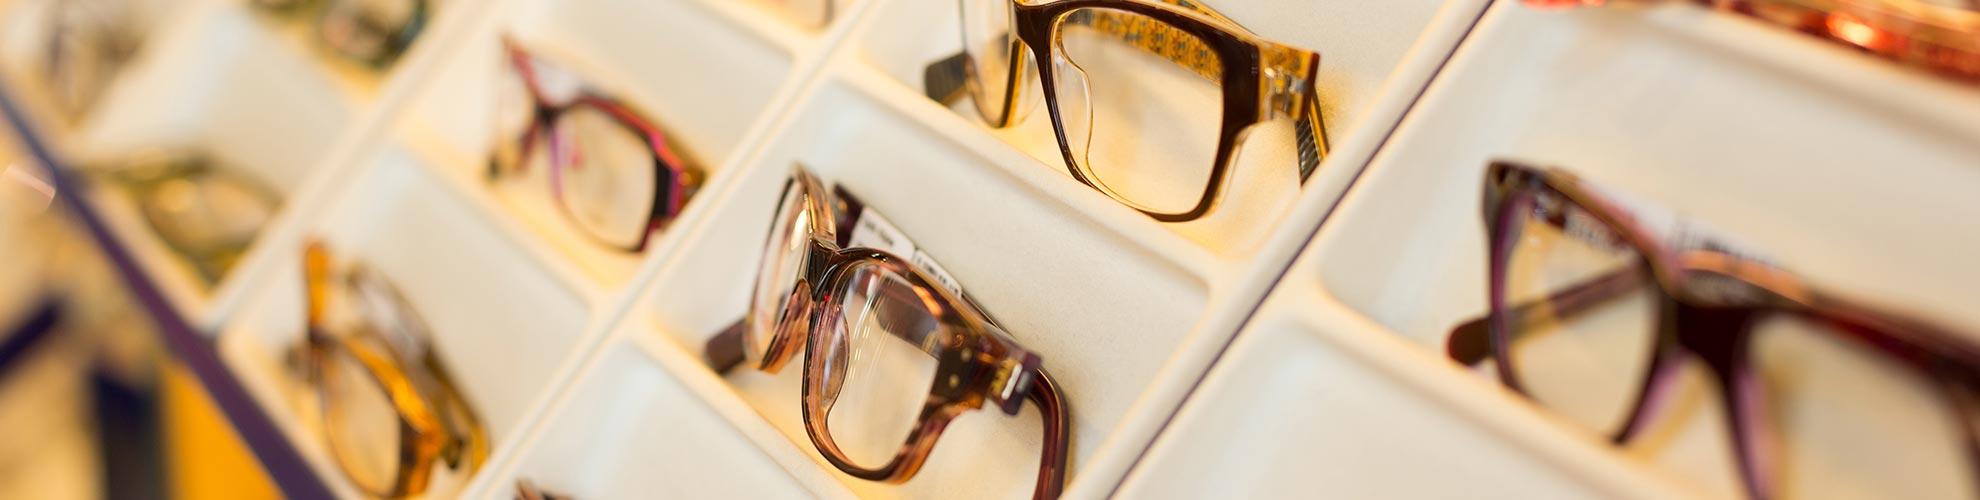 418ba7803c3 Eyeglass Frame Materials - Kennewick Vision Care